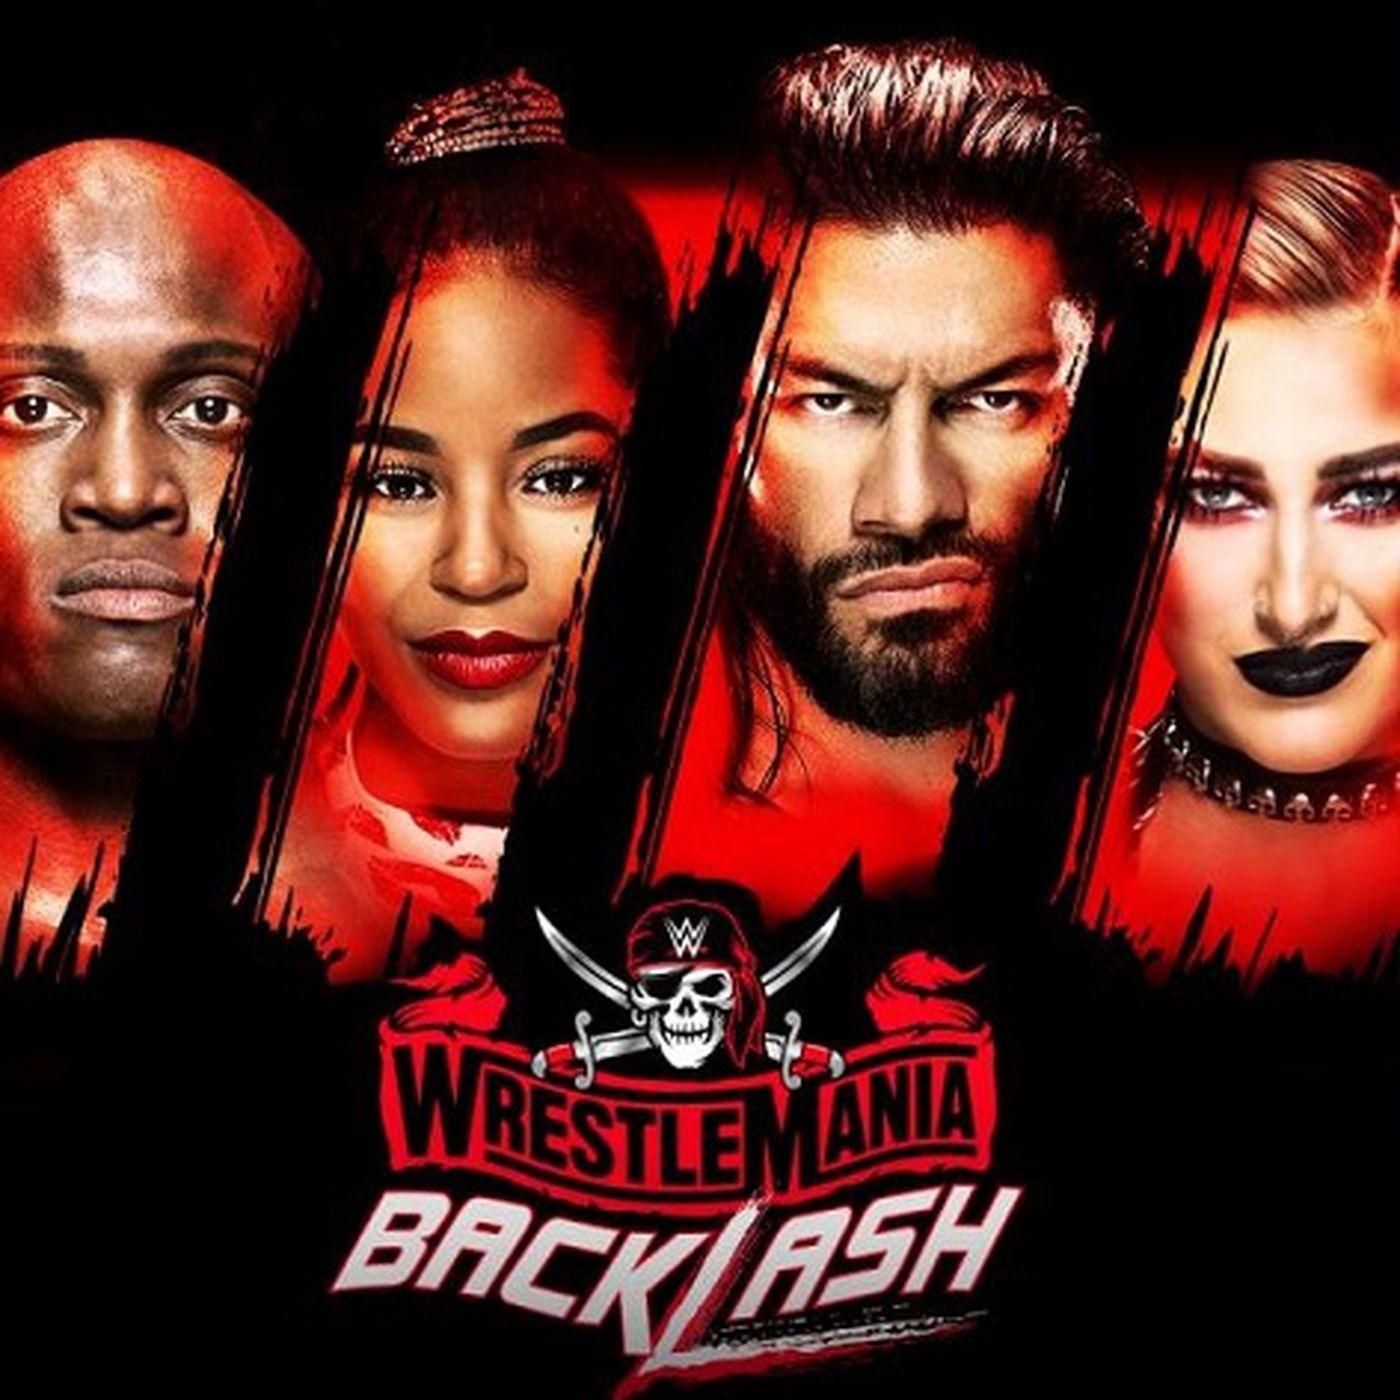 Wrestling Geeks Alliance - WrestleMania Backlash